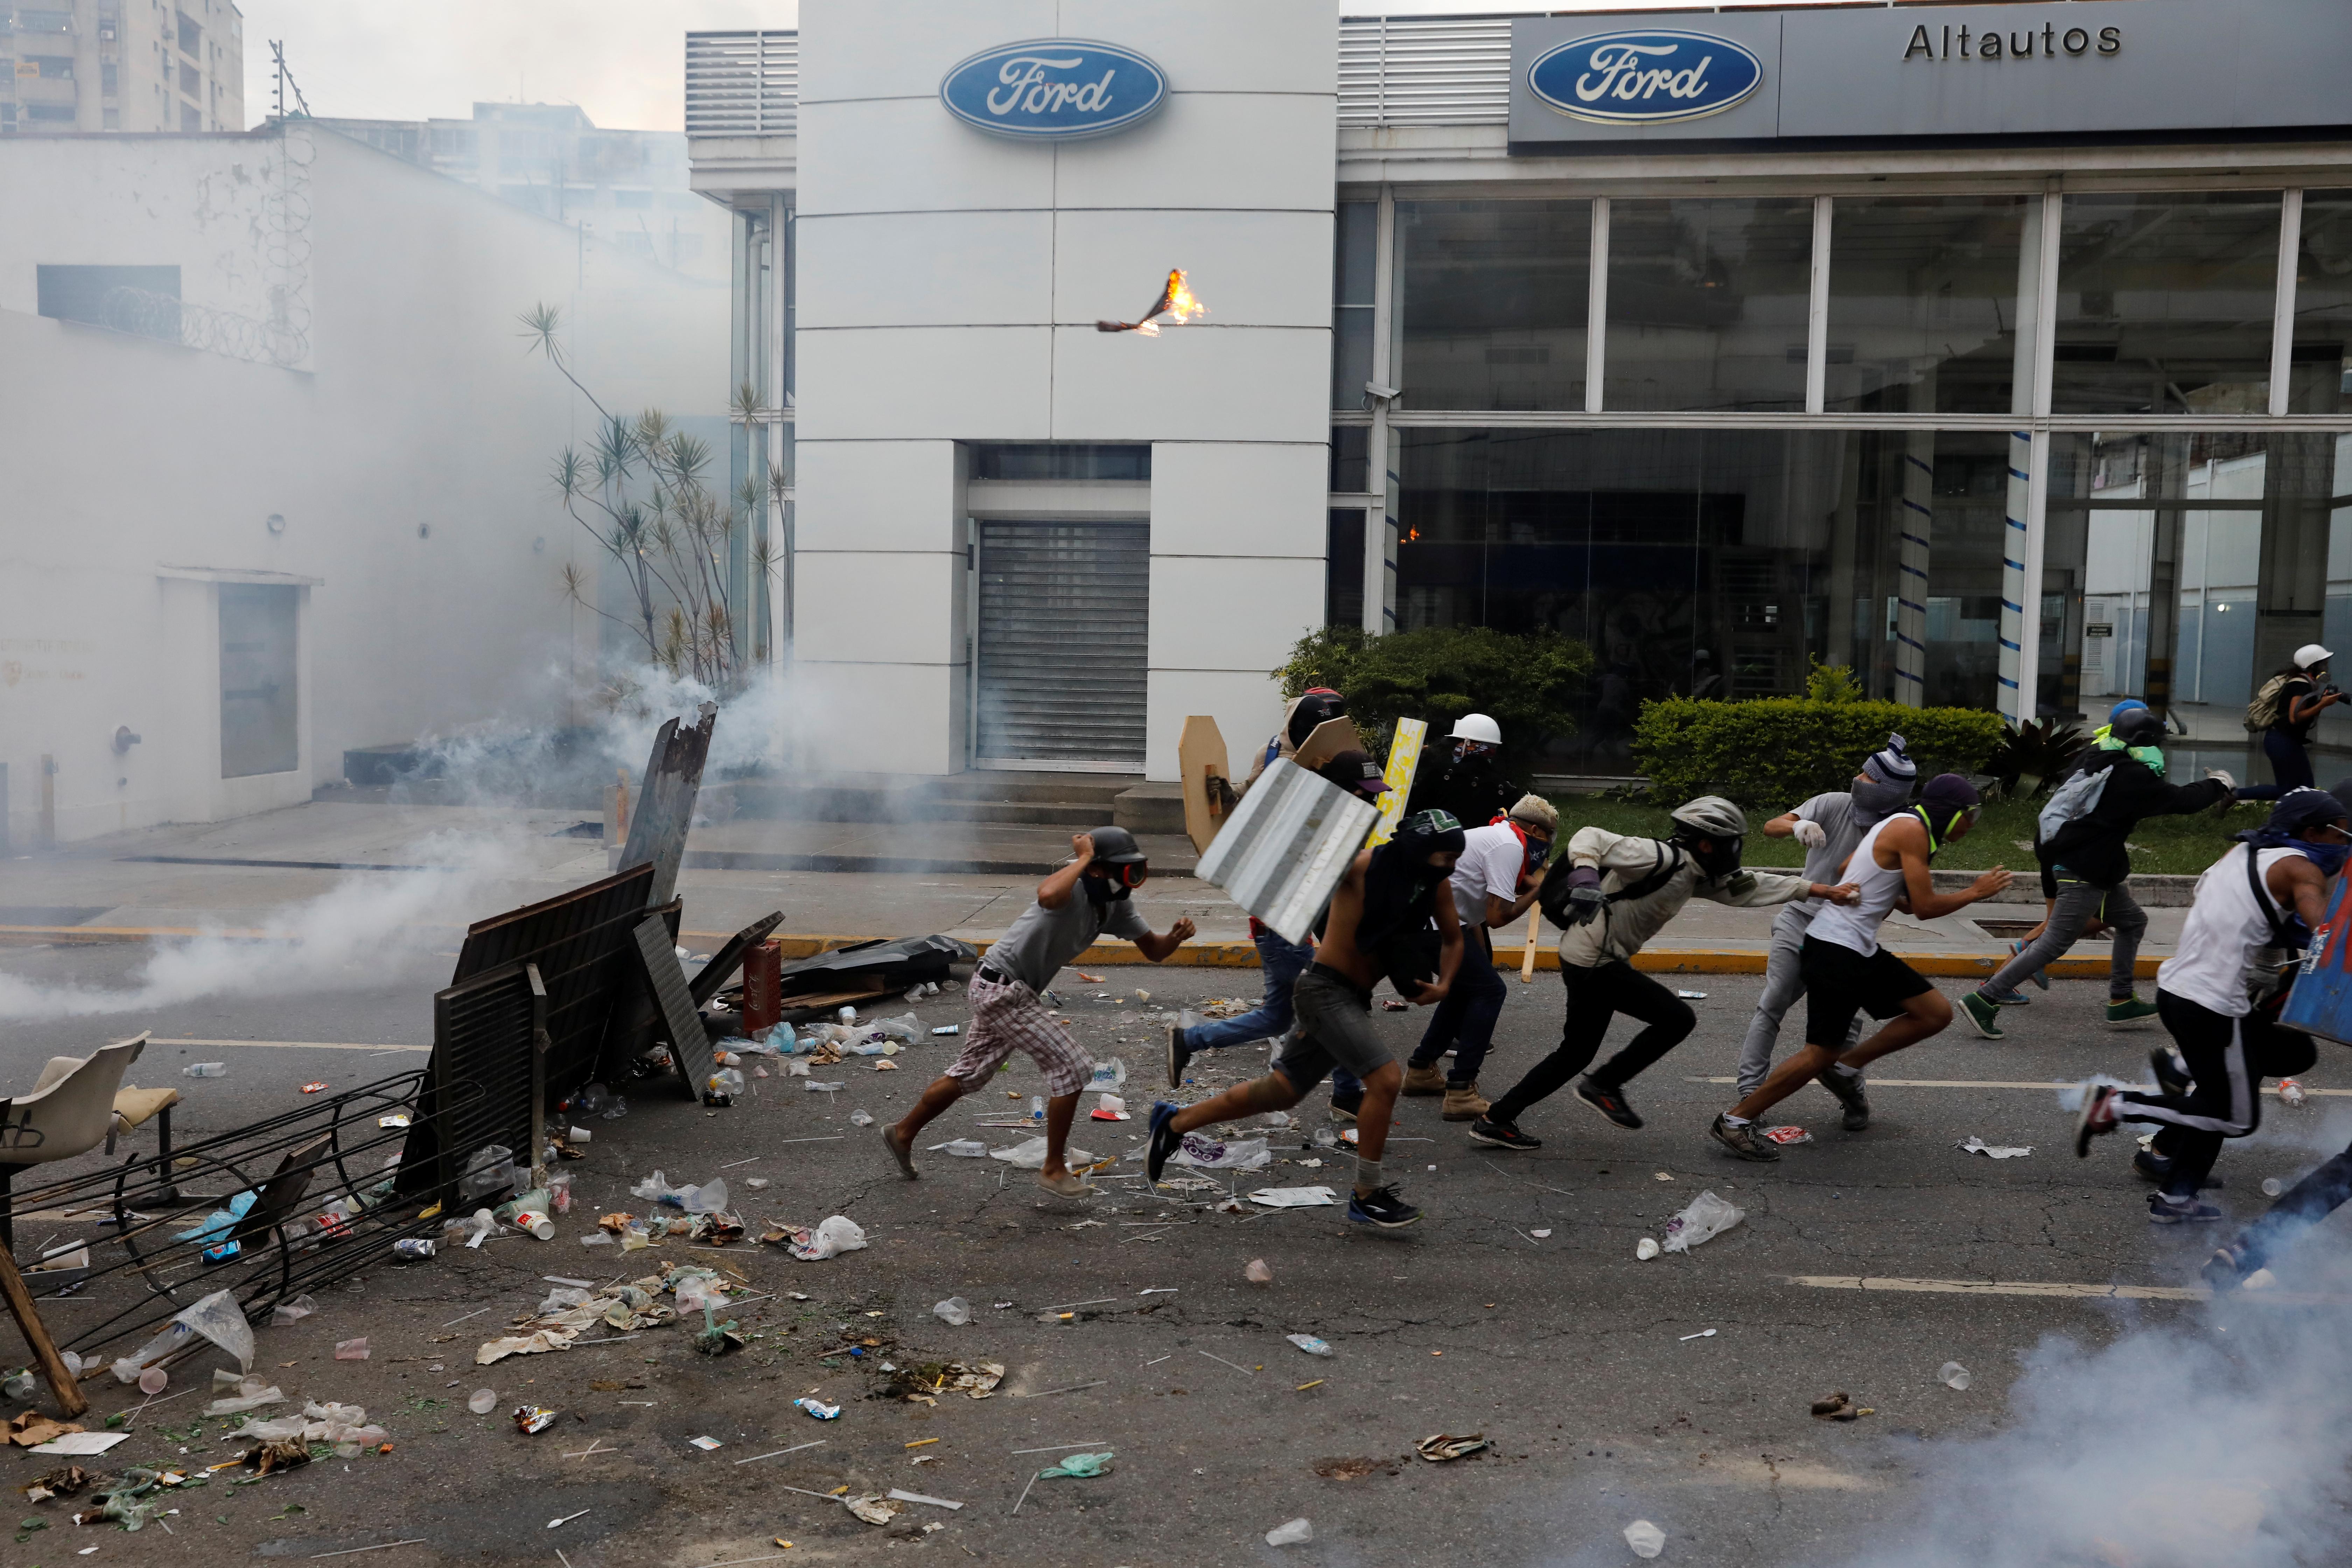 Demonstrators run as they clash with police during a rally against Venezuela's President Nicolas Maduro in Caracas, Venezuela. REUTERS/Carlos Garcia Rawlins